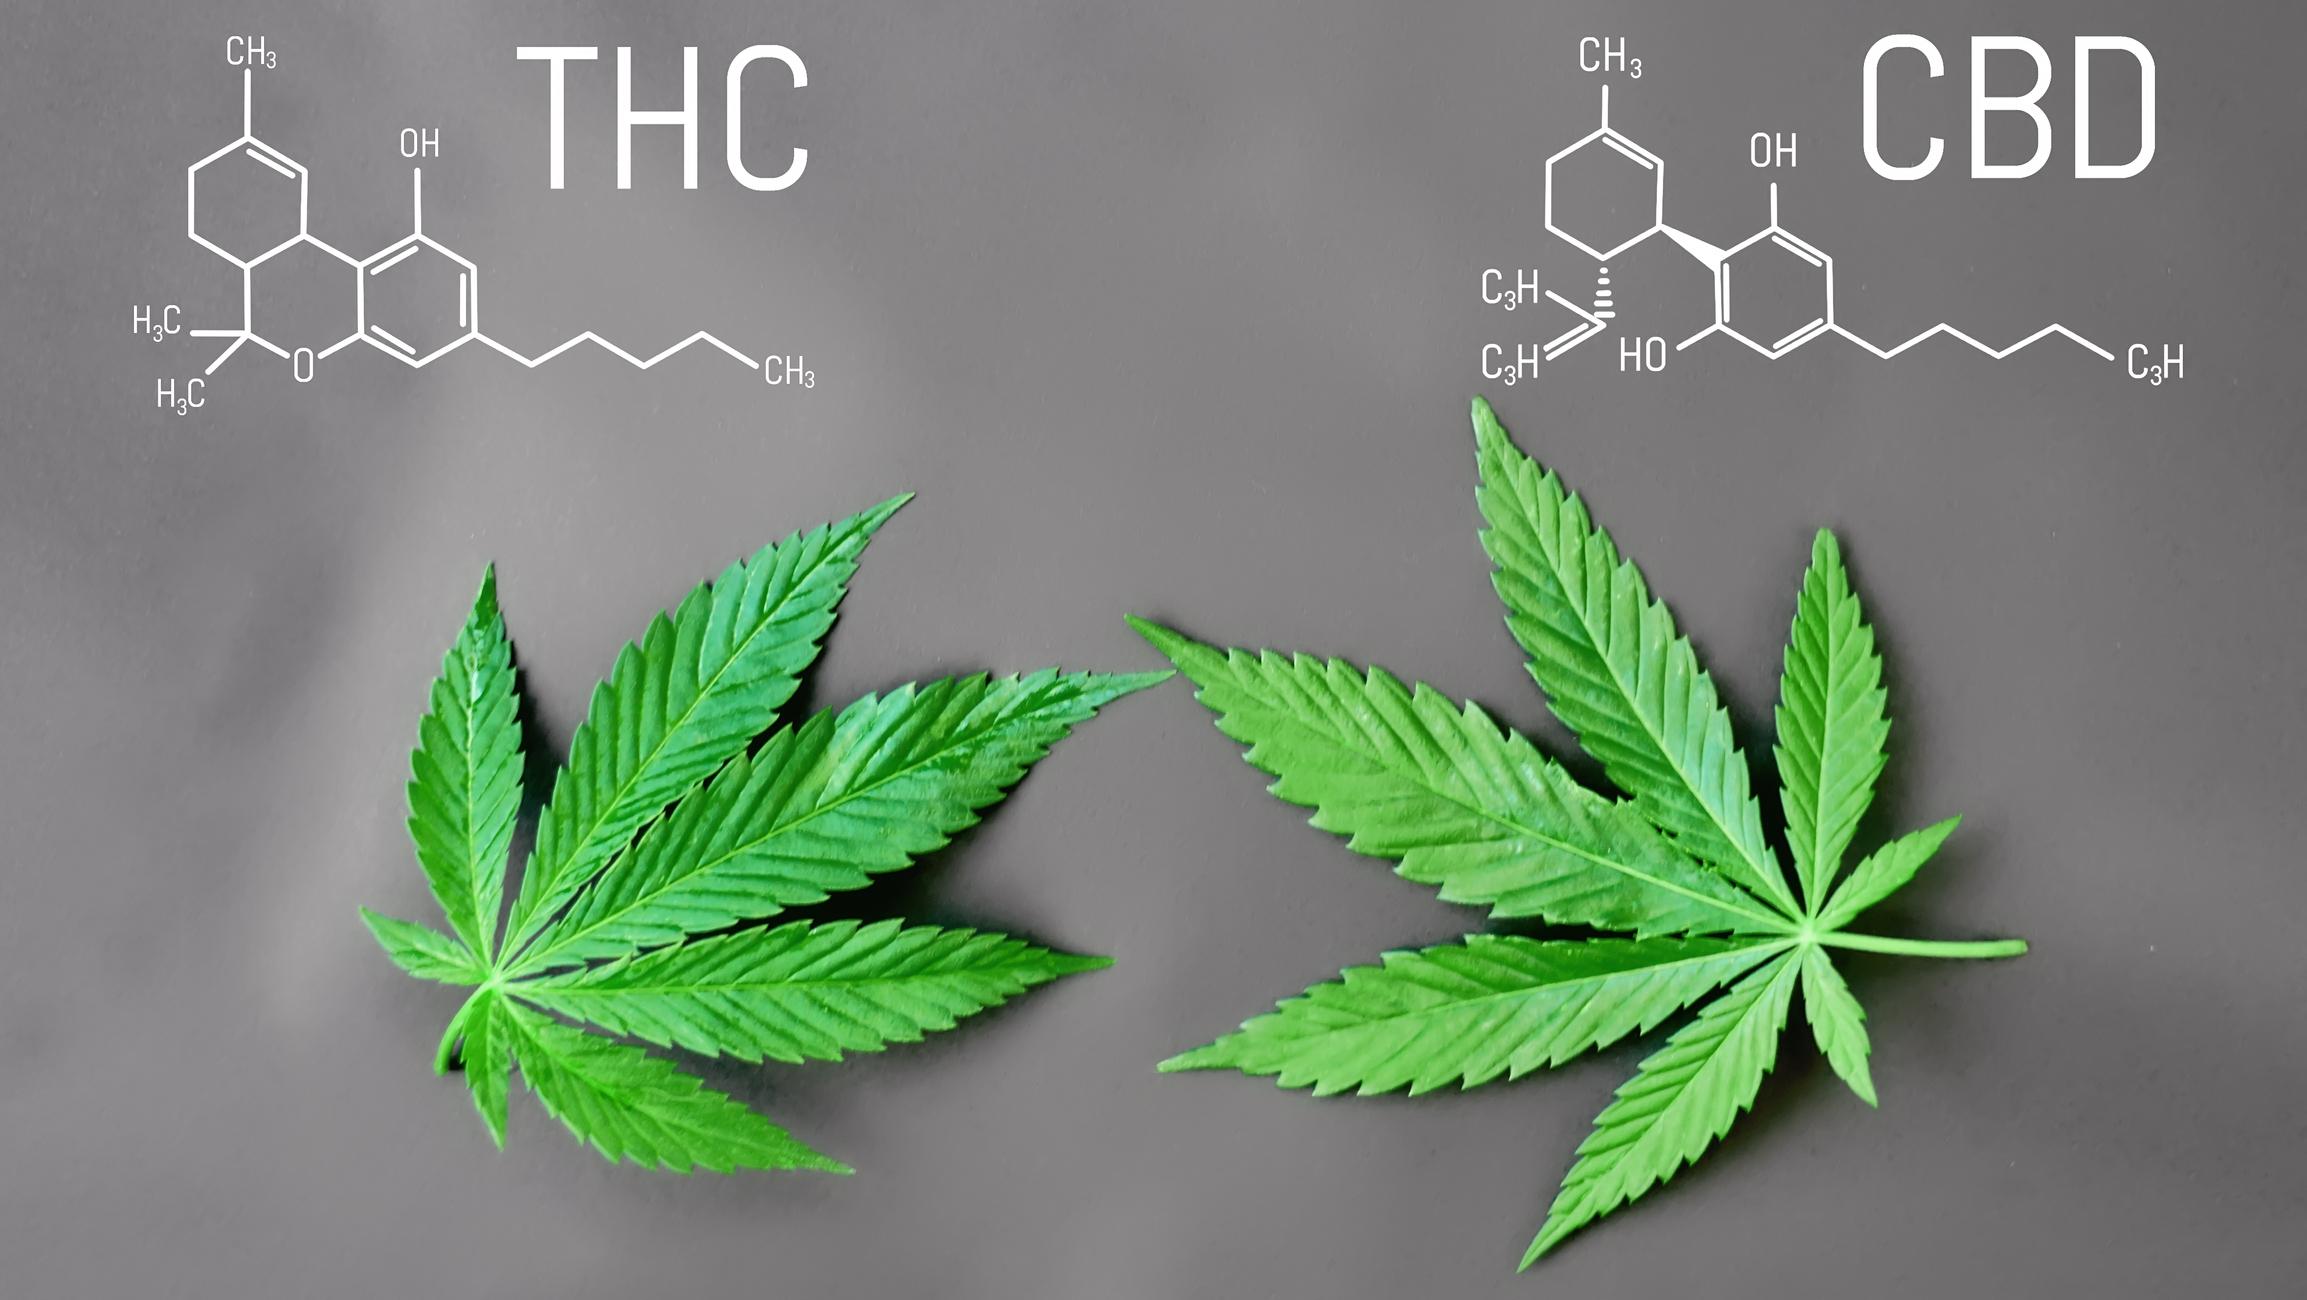 CBD legal cannabis medical virtues: anti-inflammatory, analgesic, anxiolytic, etc. CBD and THC formula. Thematic photos of hemp and green ganja. Background image